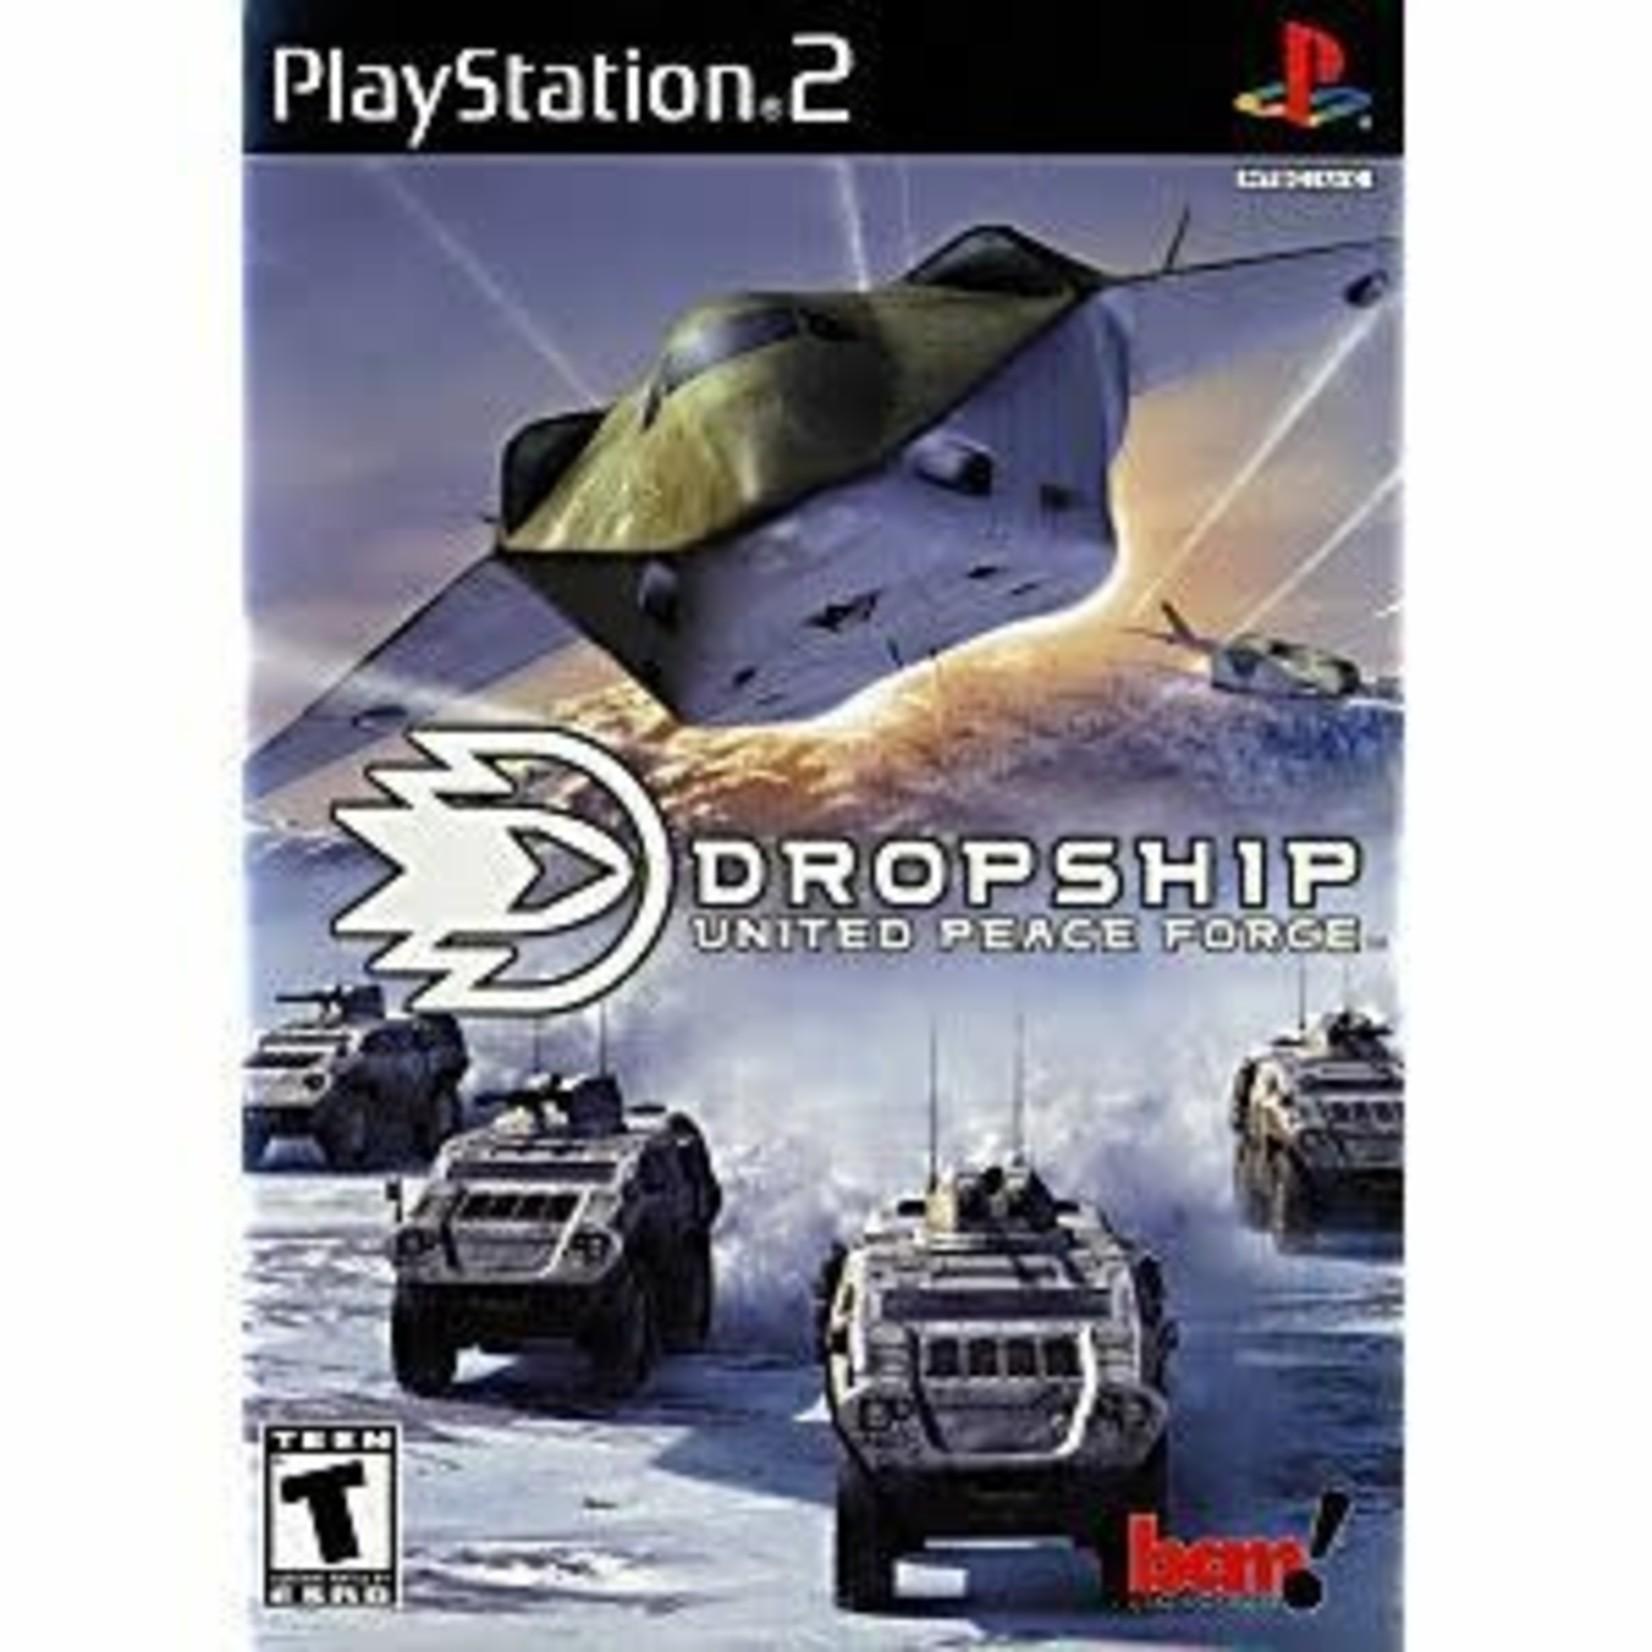 PS2U-DROPSHIP UNITED PEACE FORCE